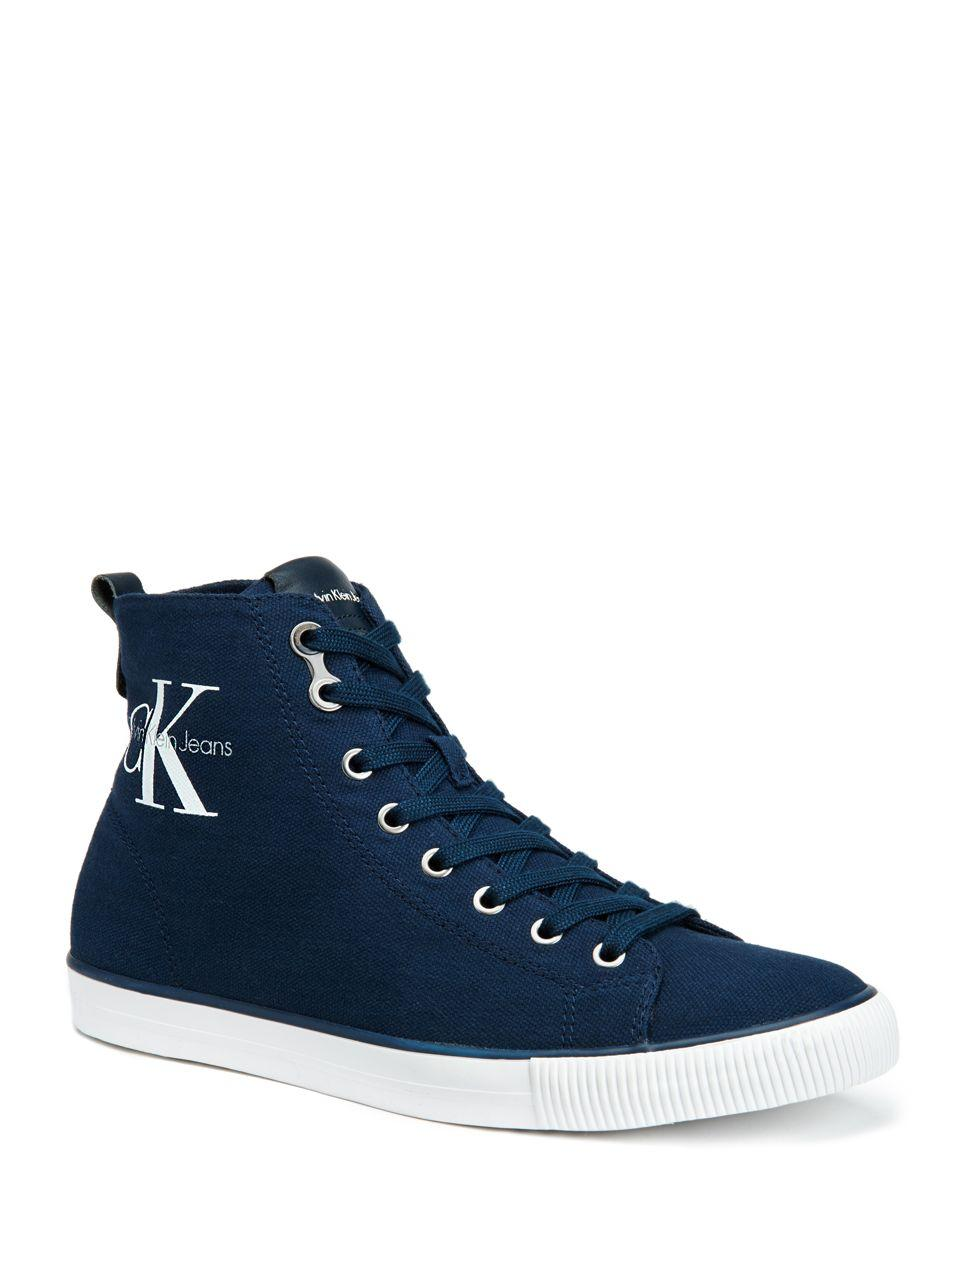 calvin klein arthur canvas high top sneakers in blue lyst. Black Bedroom Furniture Sets. Home Design Ideas